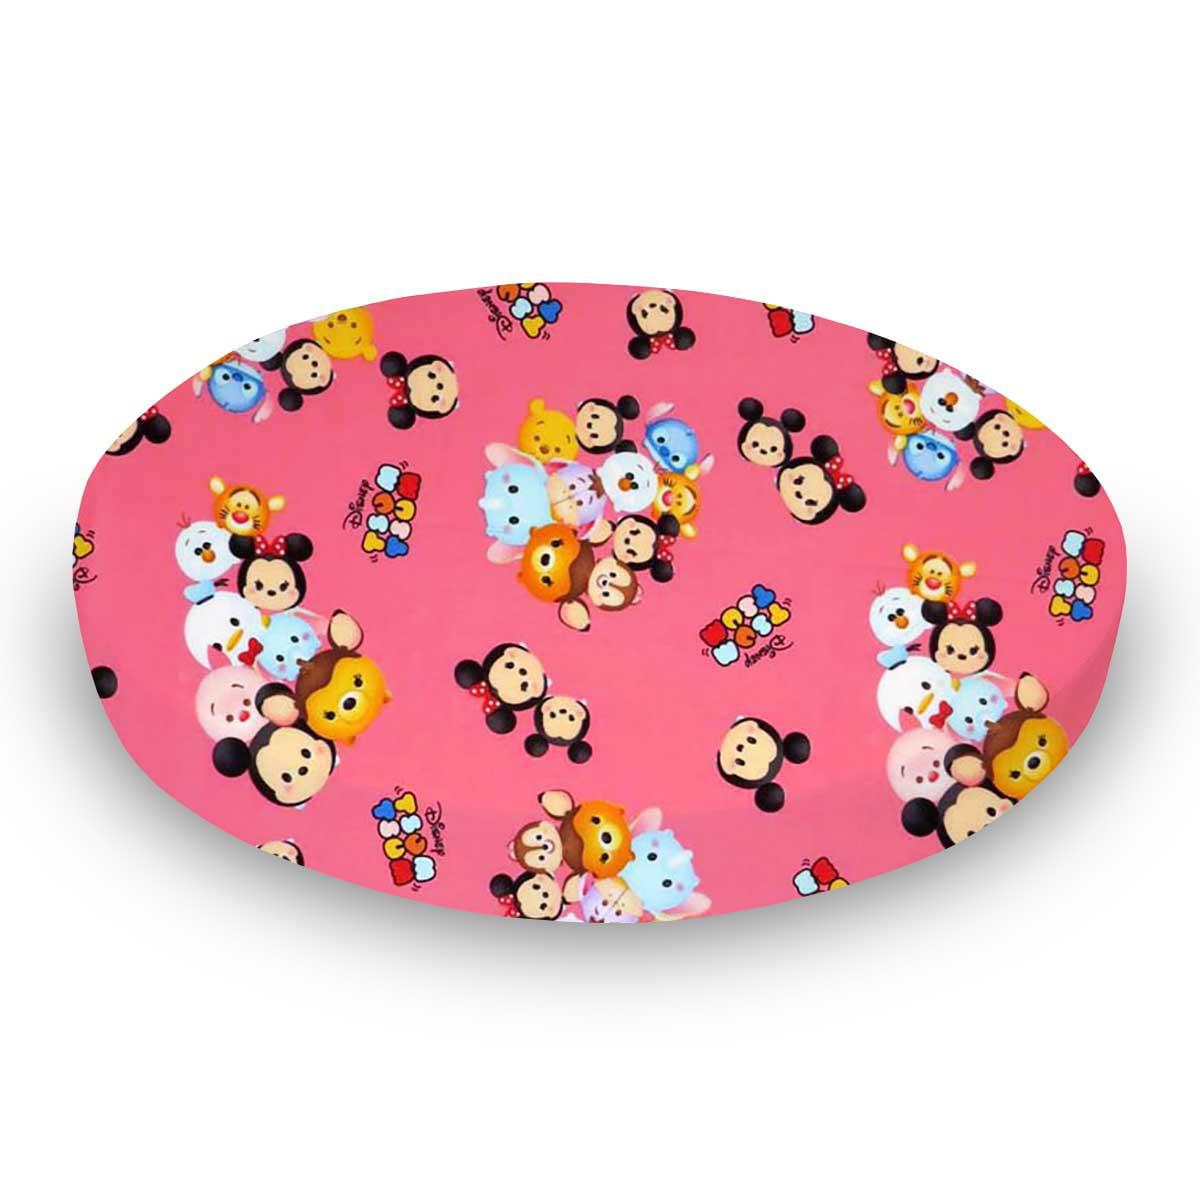 SheetWorld Fitted Oval Crib Sheet (Stokke Sleepi) - Tsum Tsum Pink